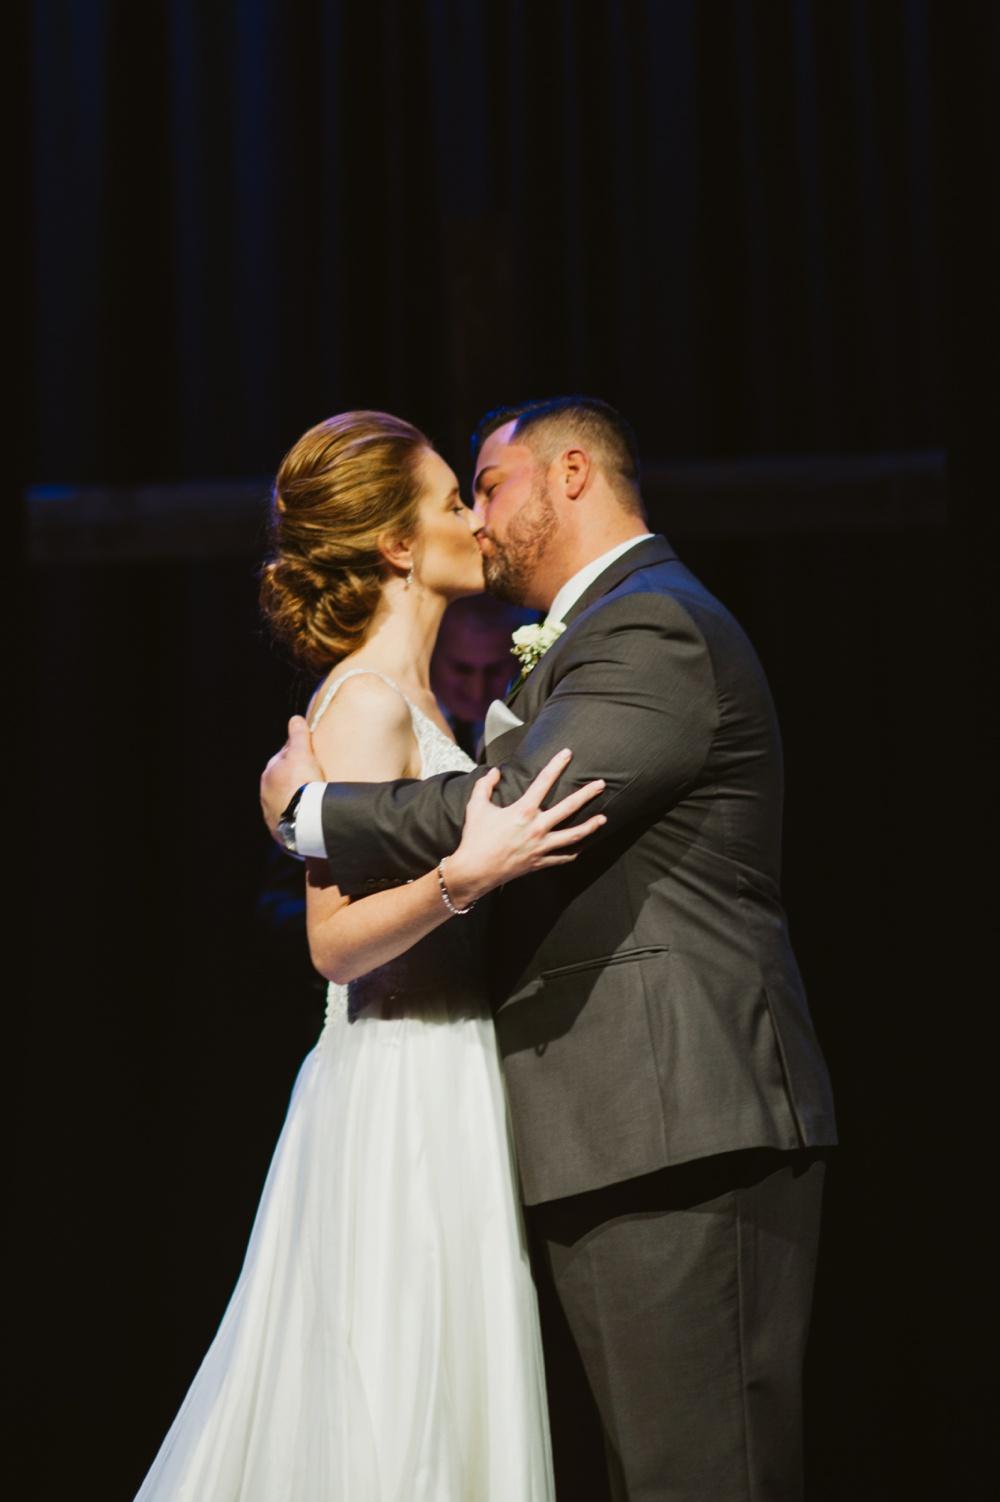 St-Louis-Wedding-Photography_0242.jpg